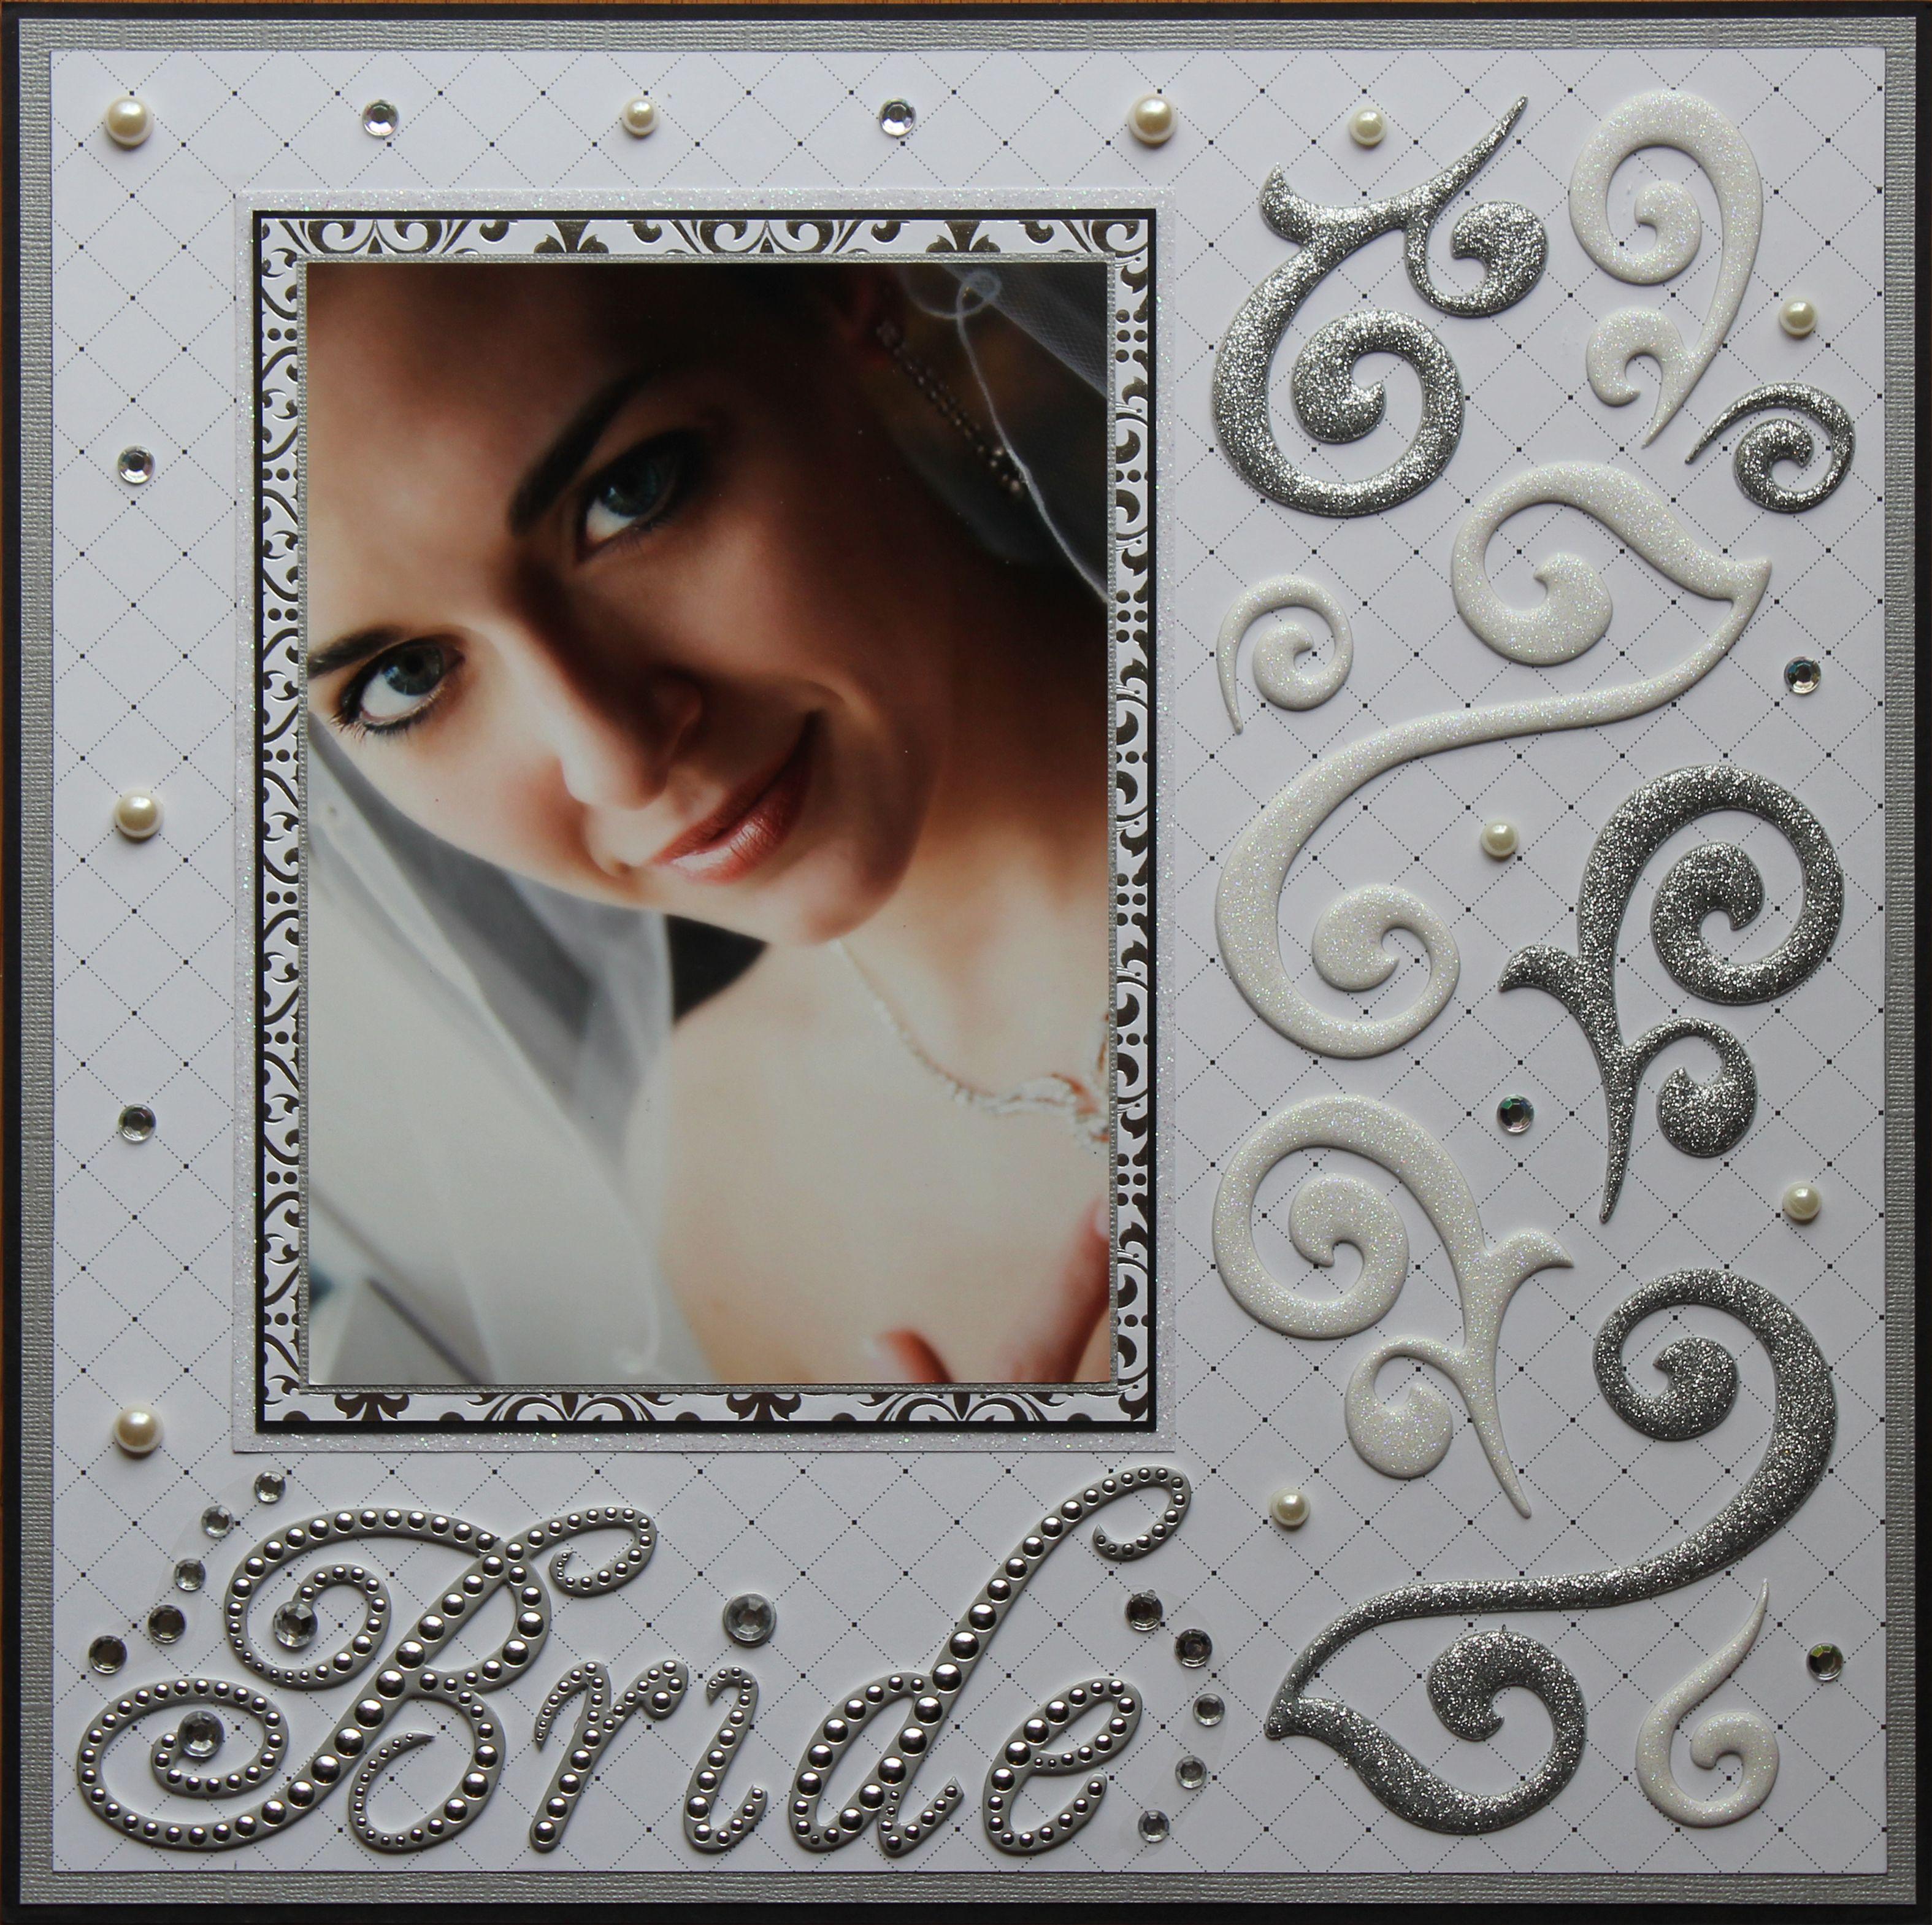 Wedding scrapbook ideas layouts - Bride An Elegantly Stunning Layout Wedding Scrapbooking